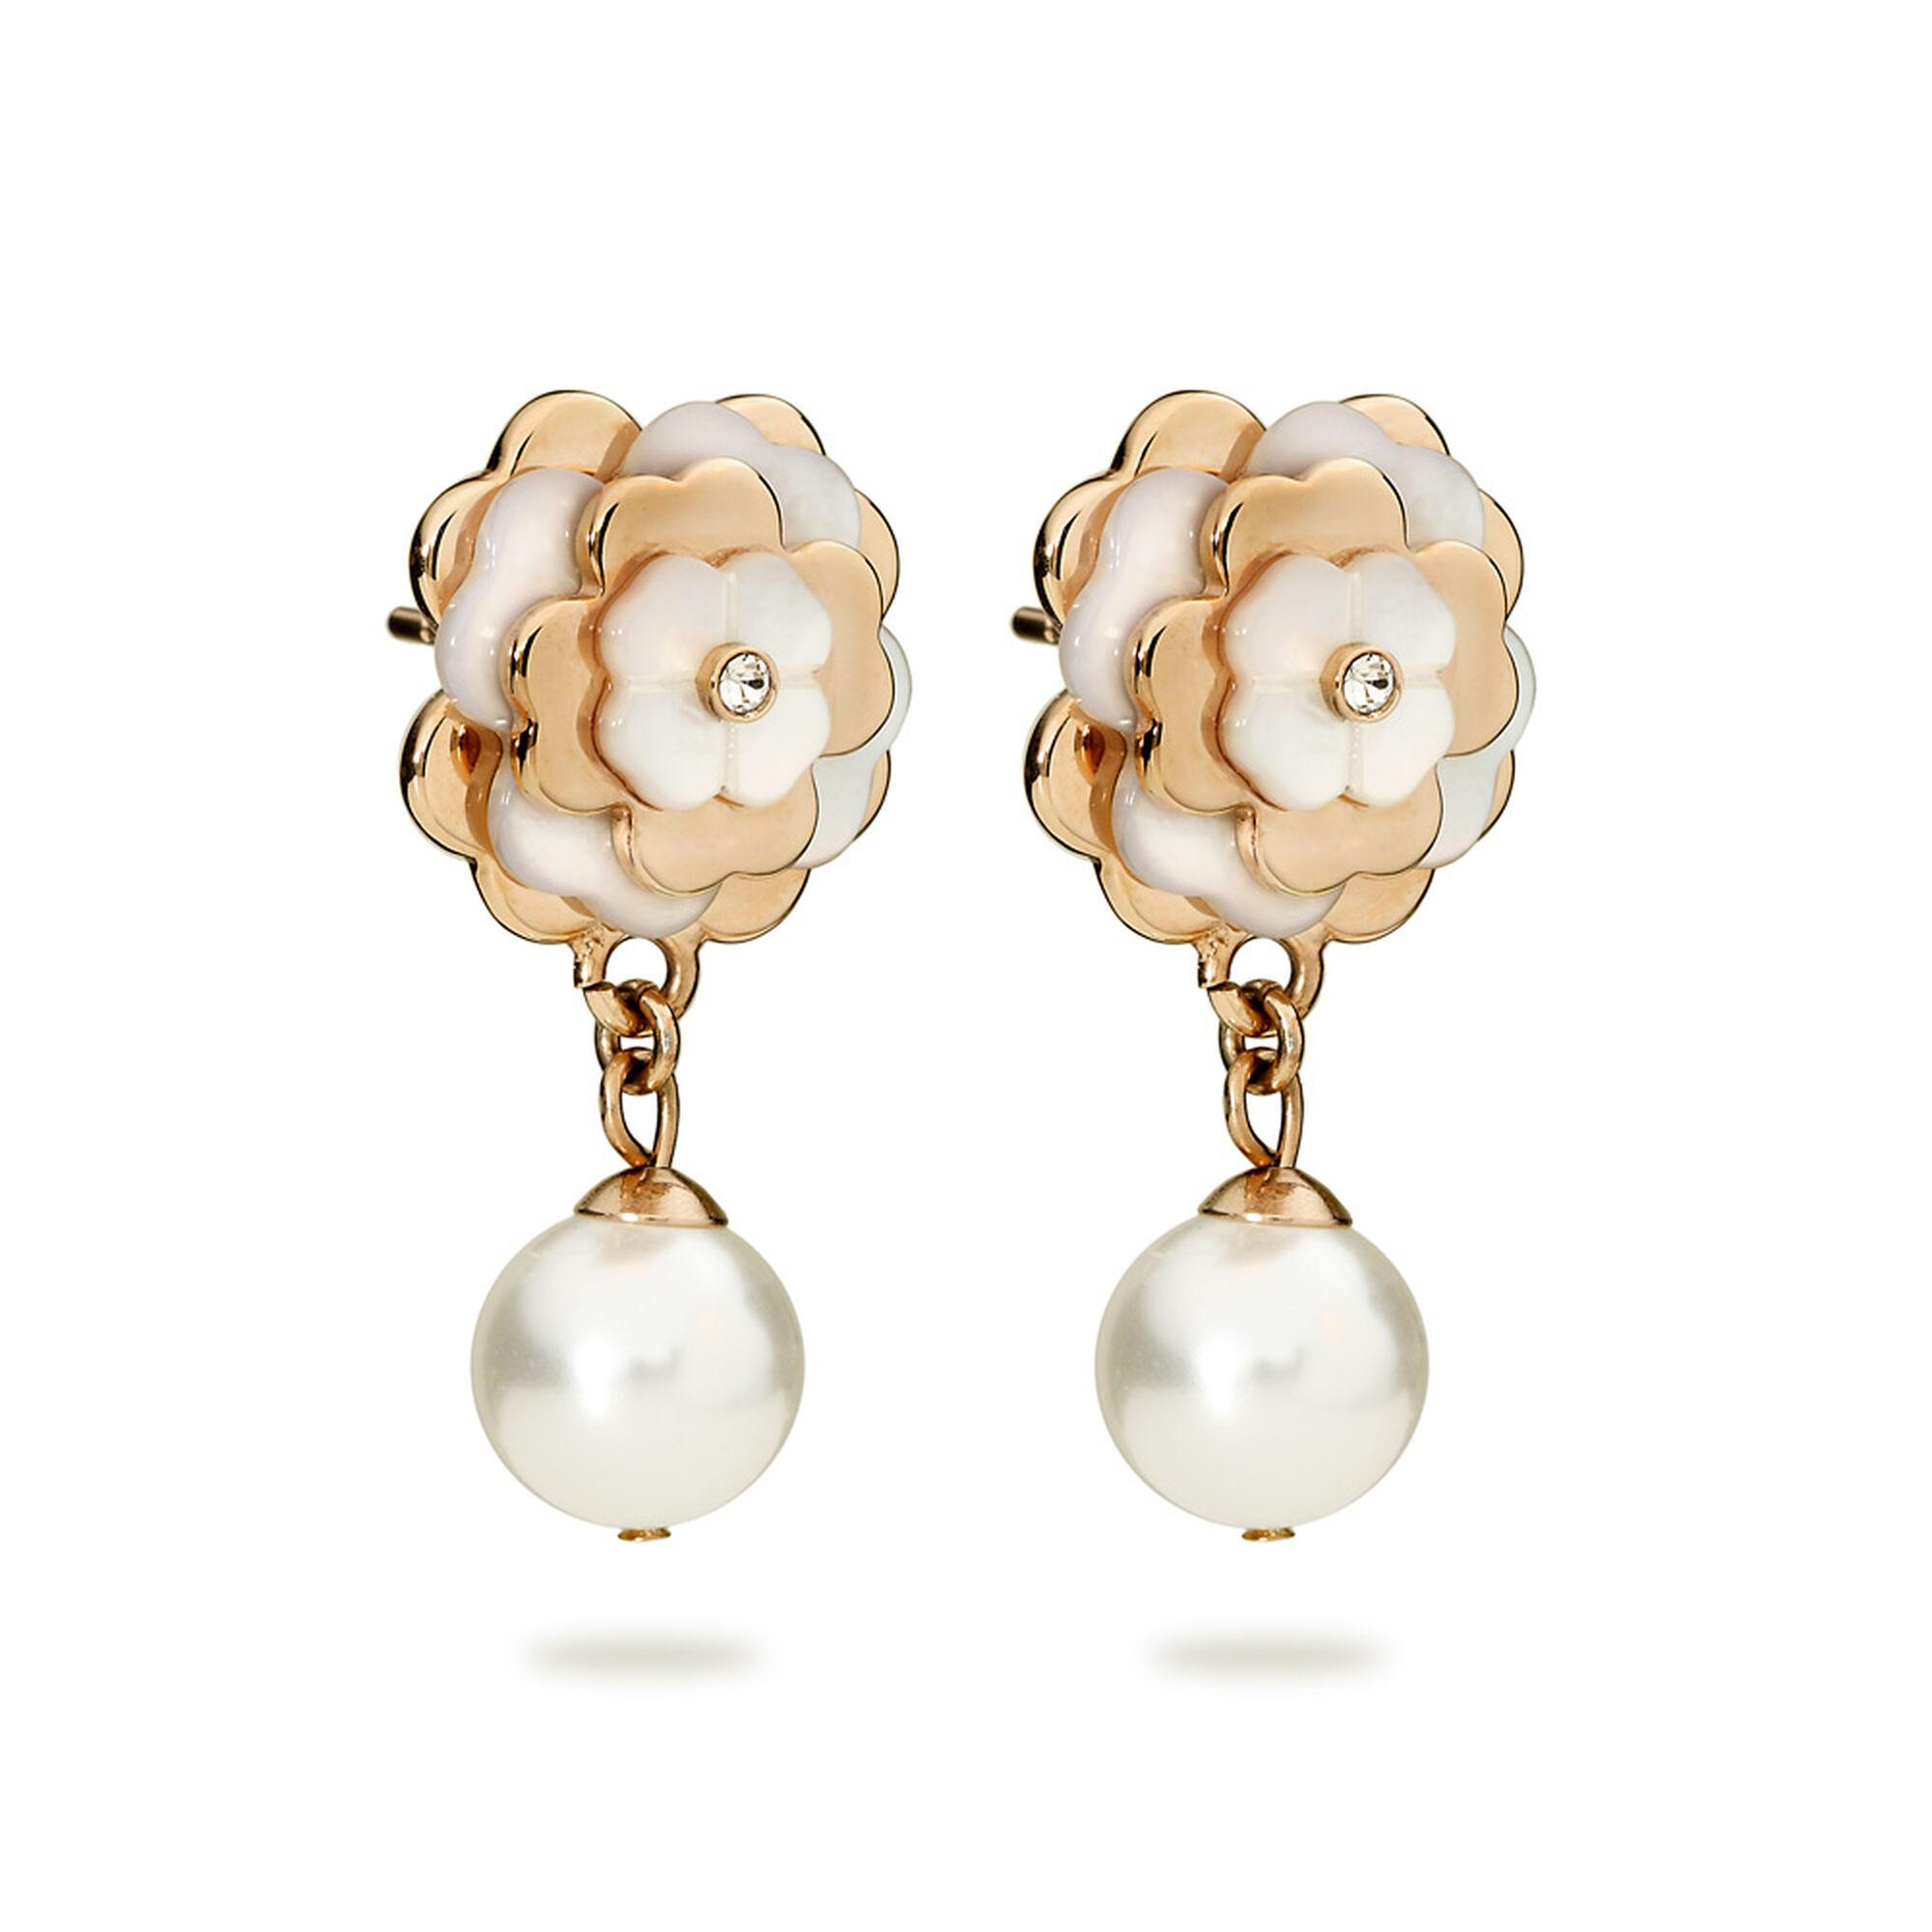 Santorini Flower Rose Gold Plated Mother Of Pearl Short Earrings, , Hires